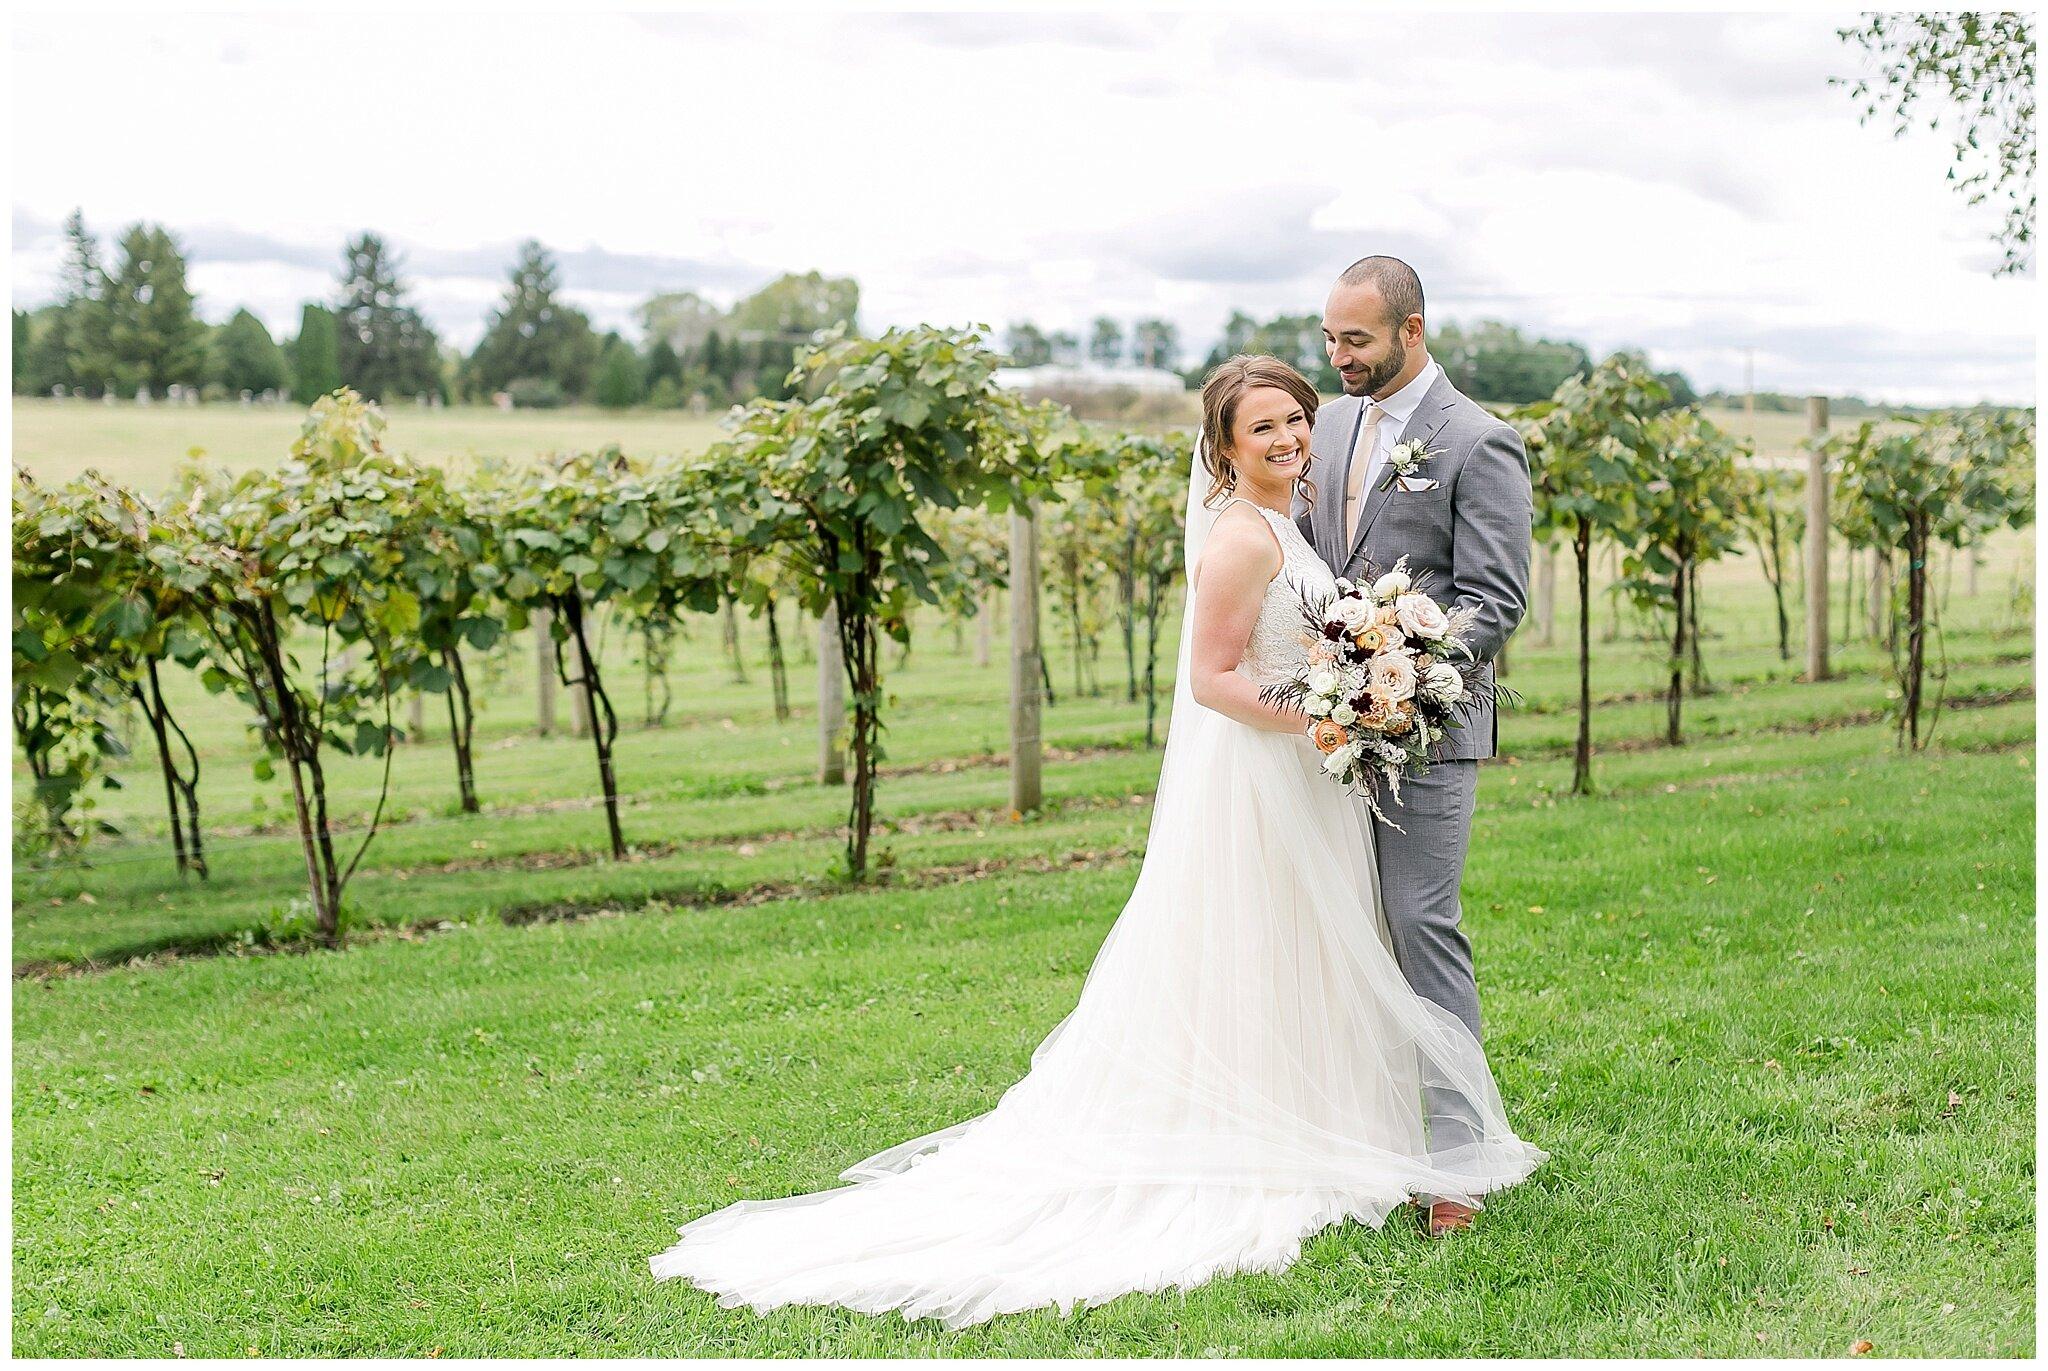 over_the_vines_edgerton_wisconsin_wedding_madison_wisconsin_photographer_0421.jpg